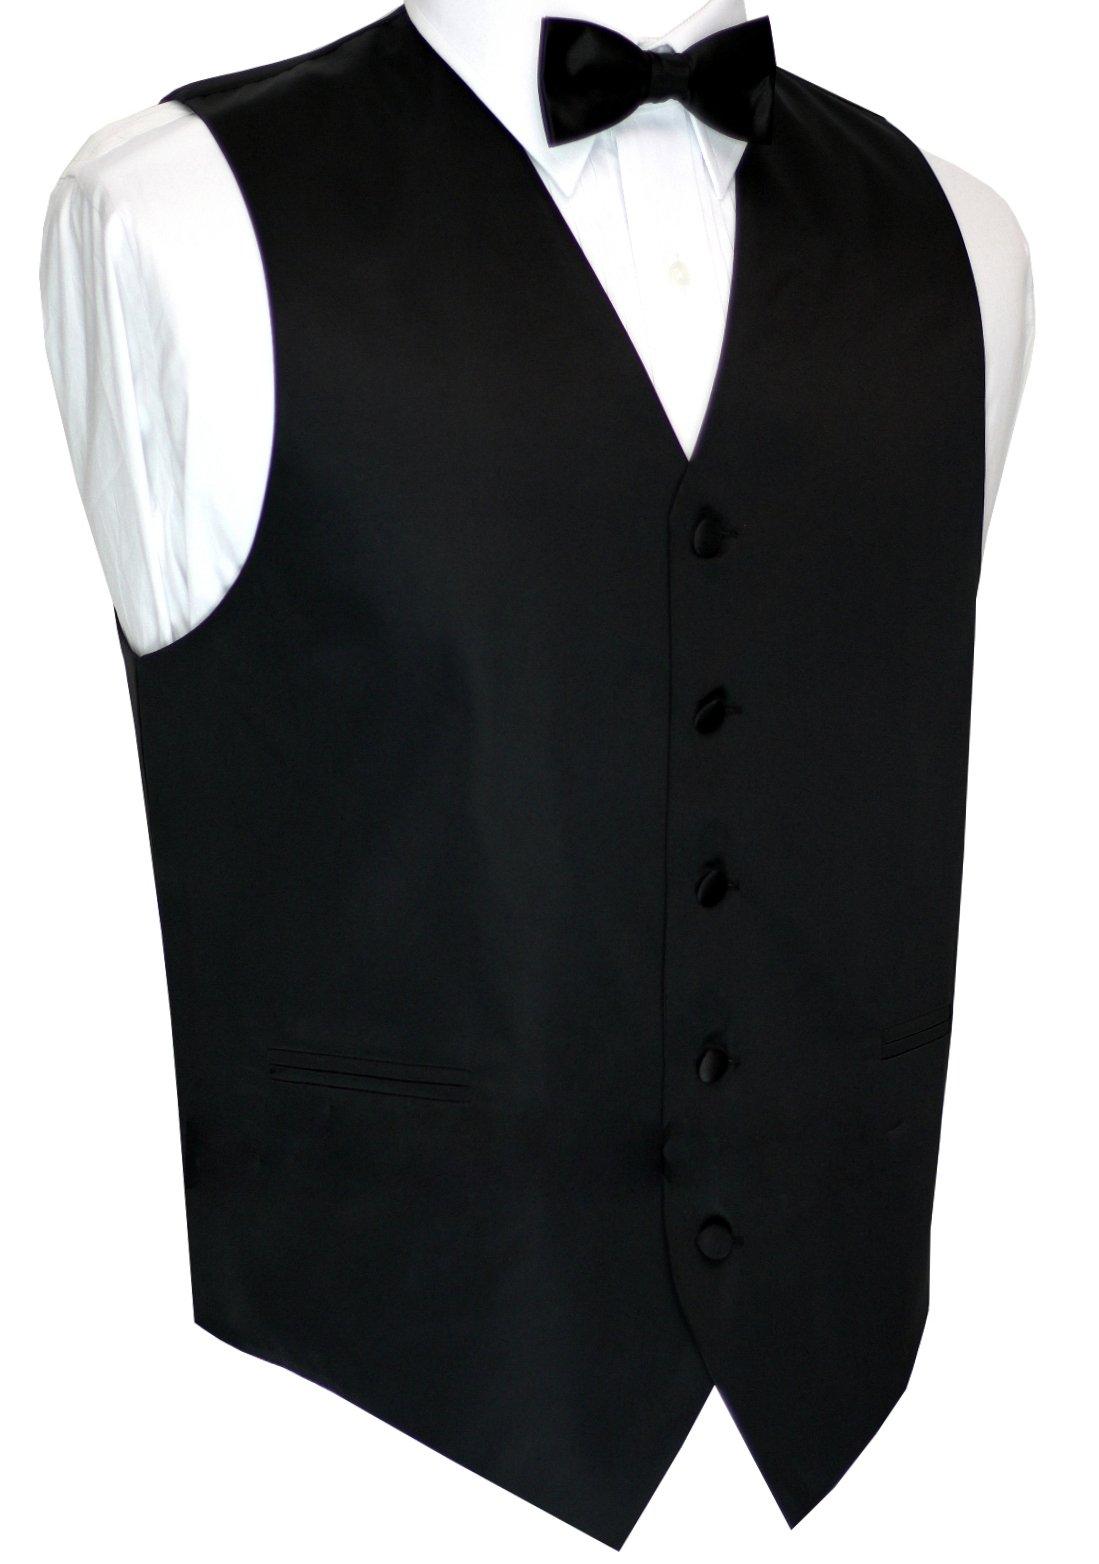 Best Tuxedo Now in Long length Italian Design, Men's Tuxedo Vest, Bow-Tie & Hankie Set in Black - 3XL/Long